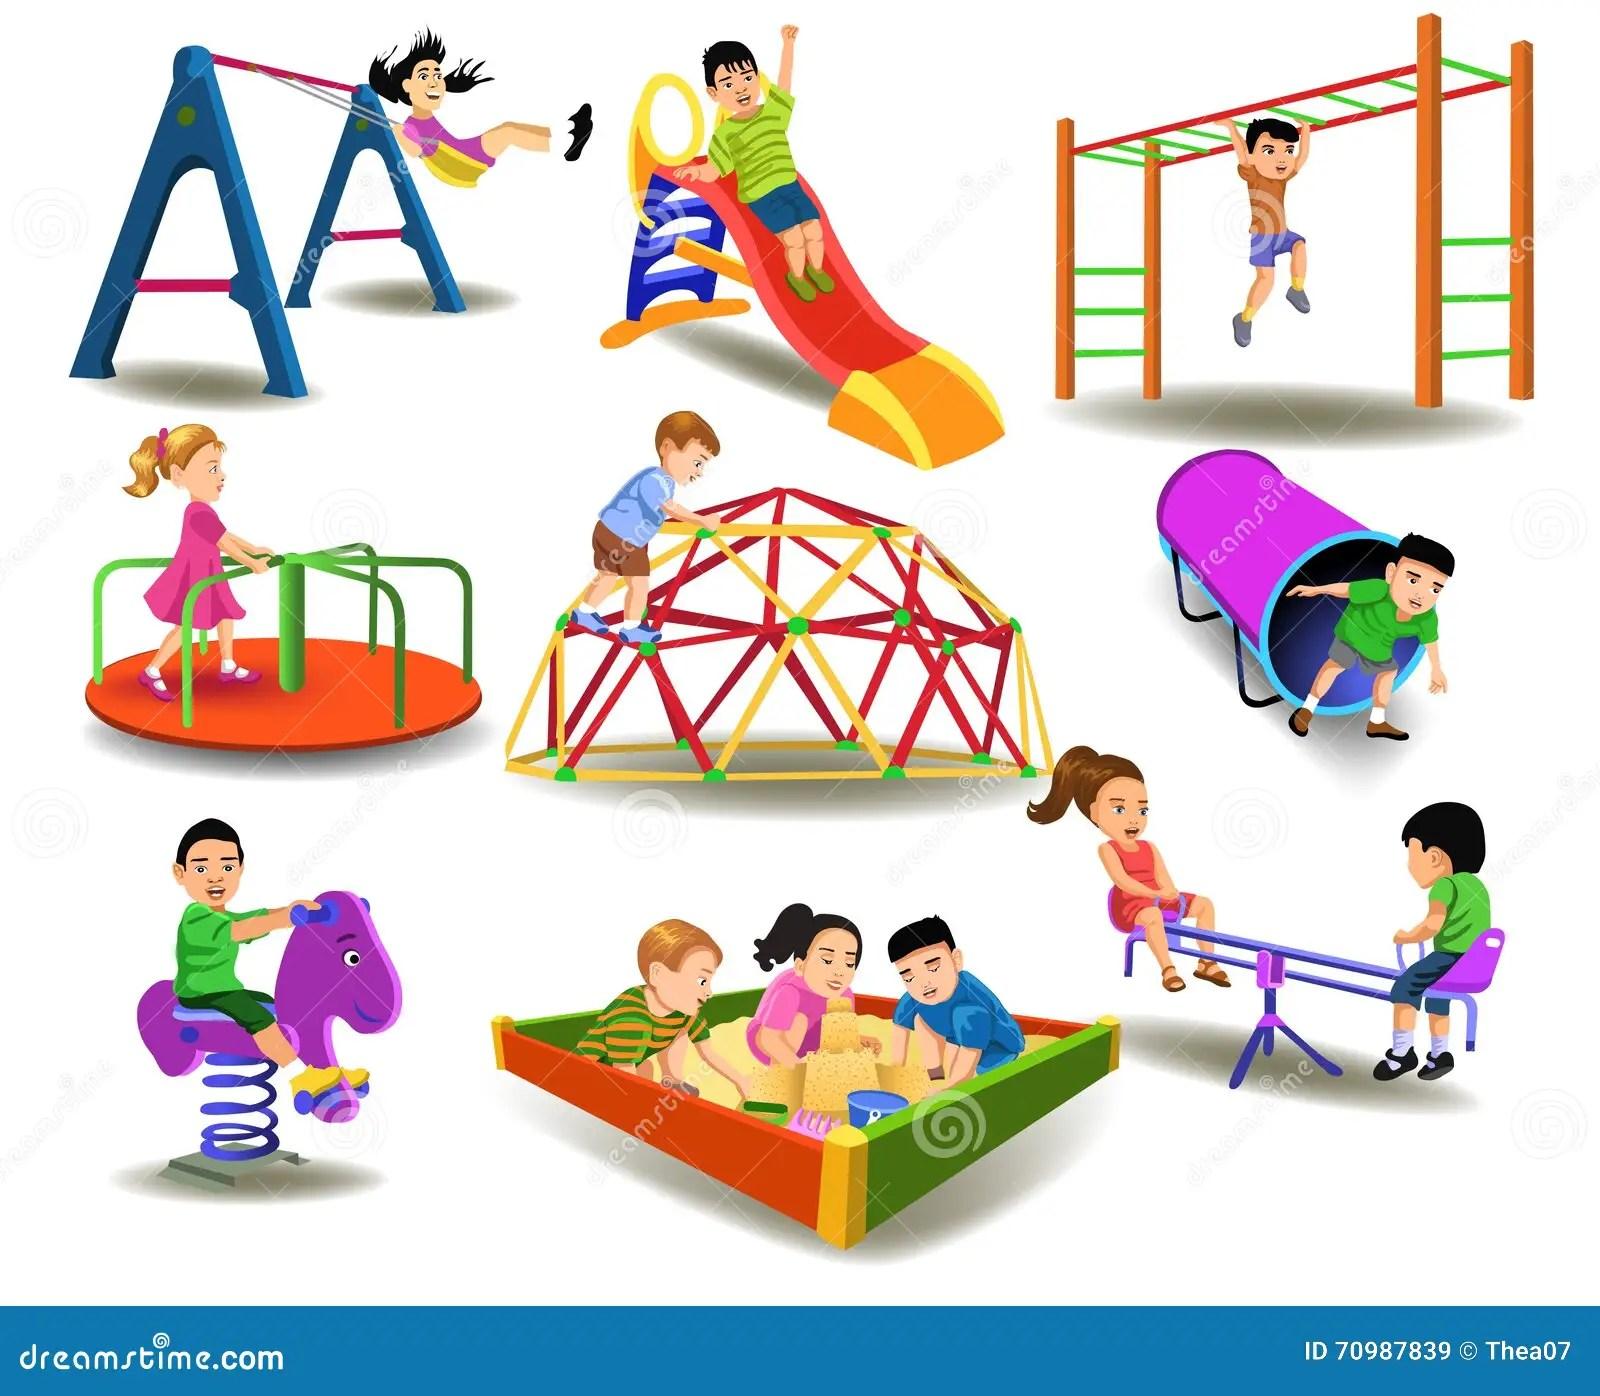 Children Having Fun At The Playground Stock Vector